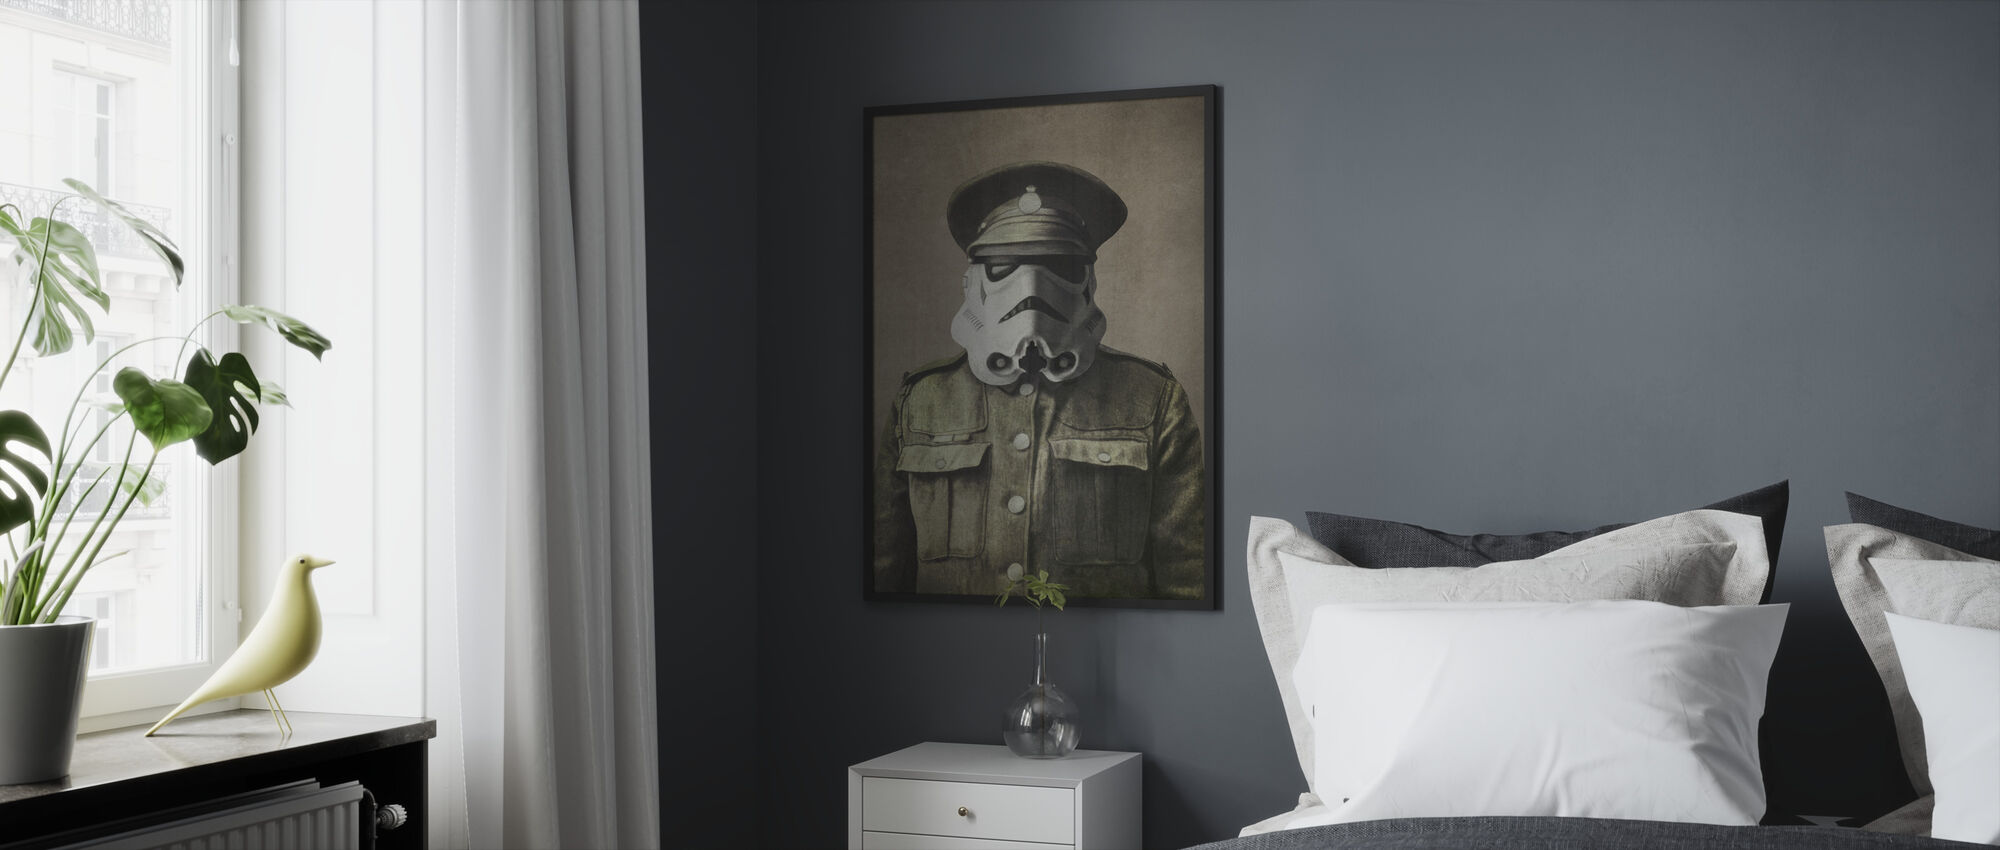 Victorian Wars Sgt. Stormley - Framed print - Bedroom